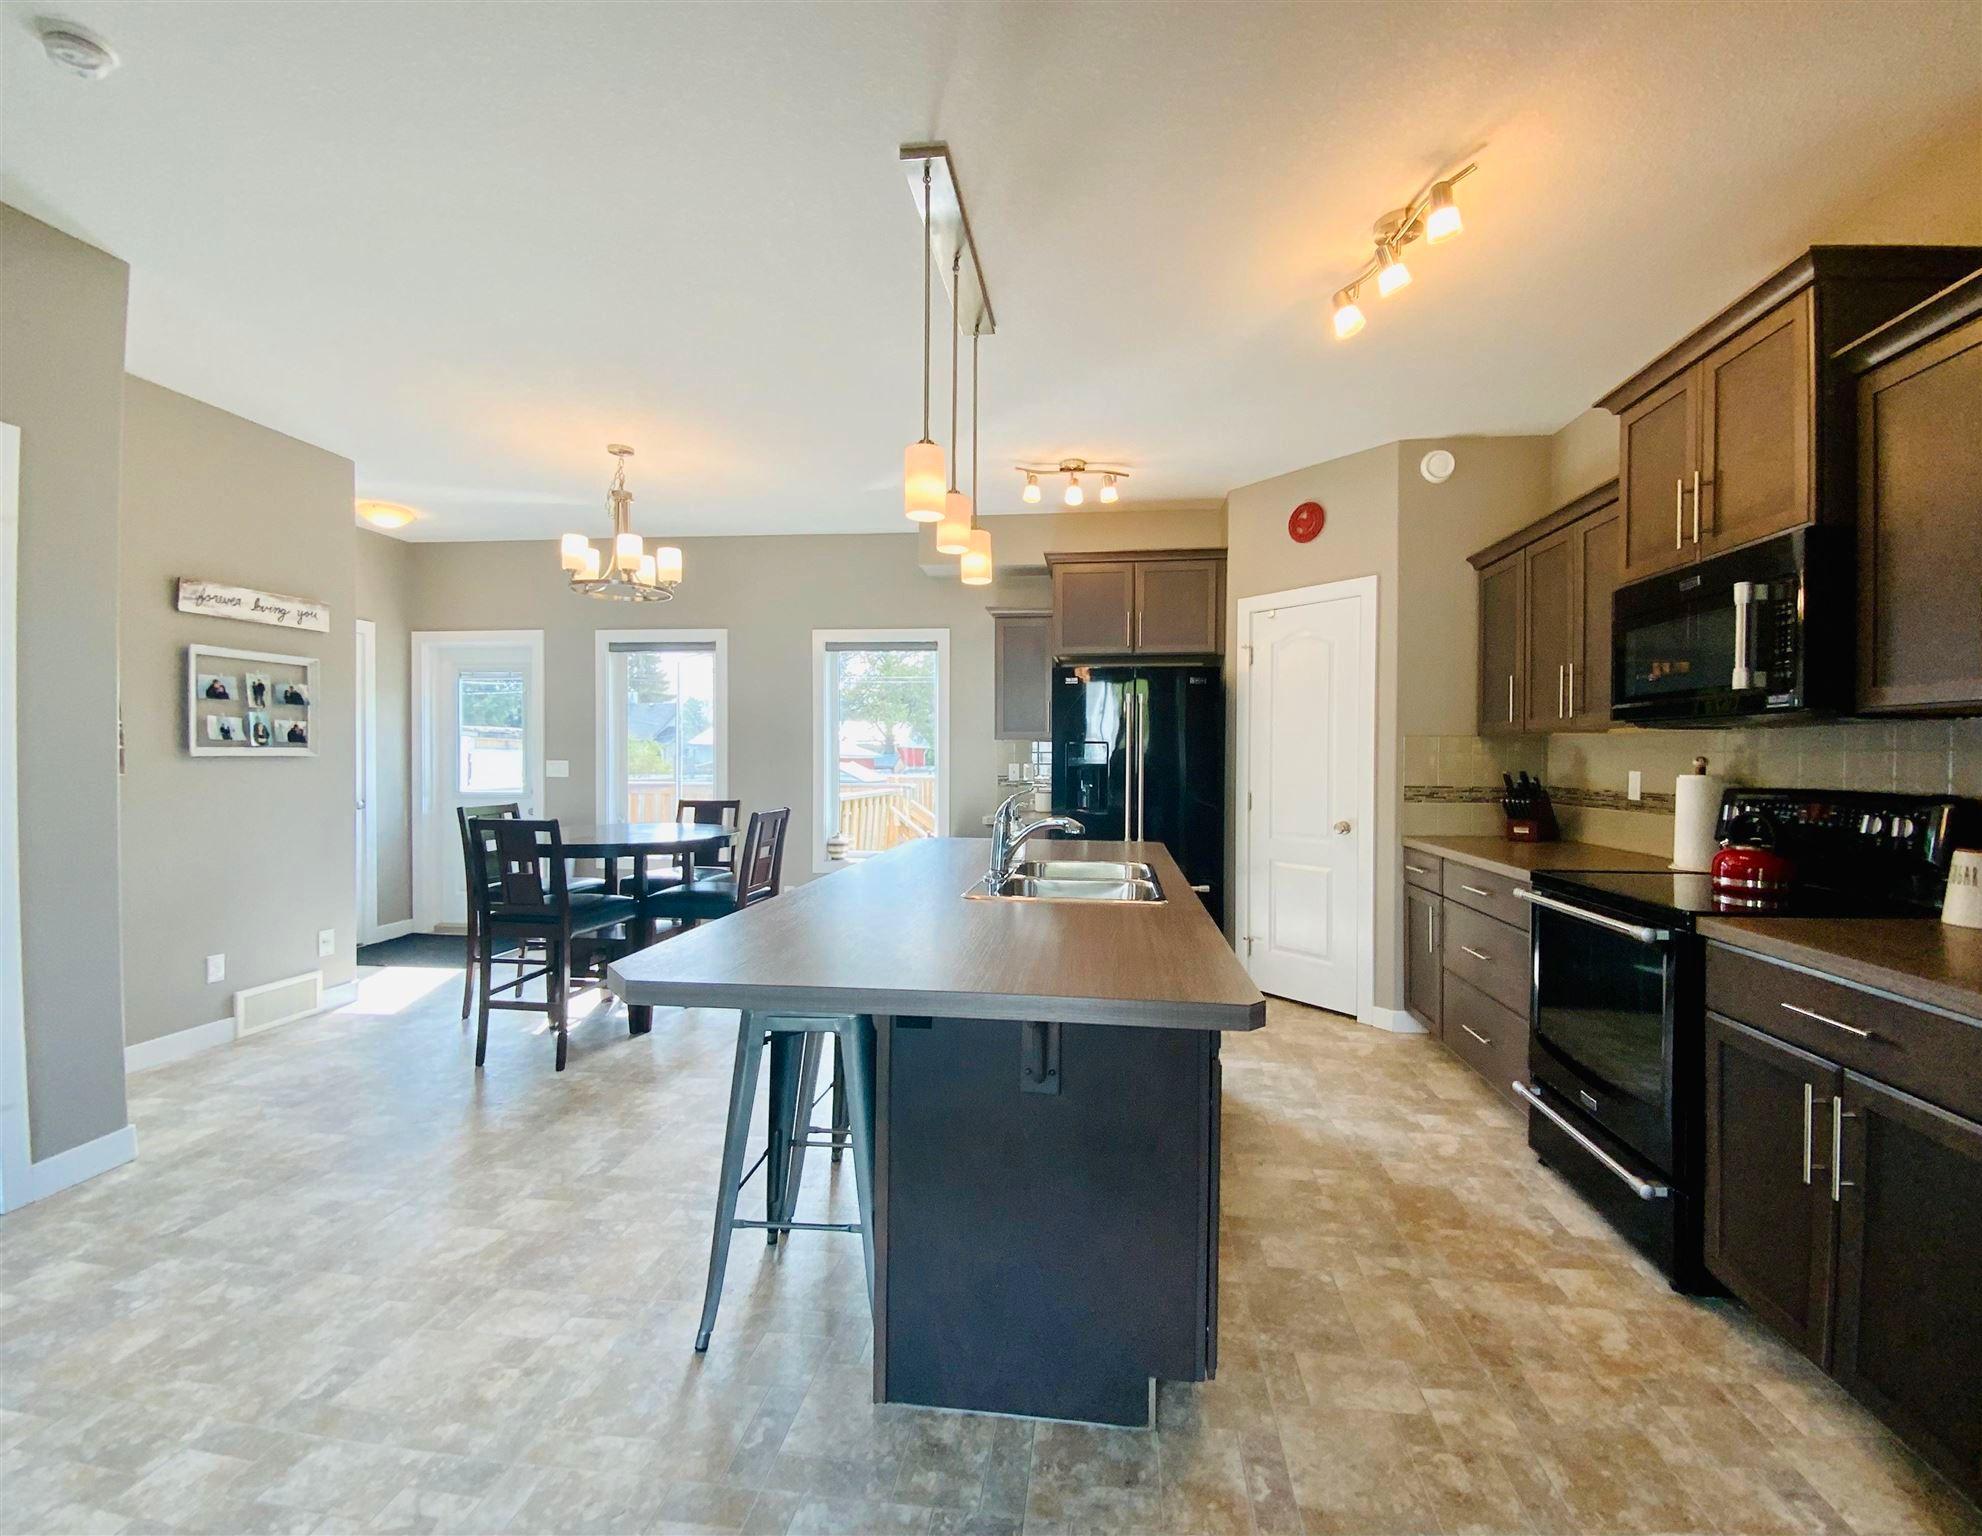 Main Photo: 4506 53 Street: Wetaskiwin House for sale : MLS®# E4247553